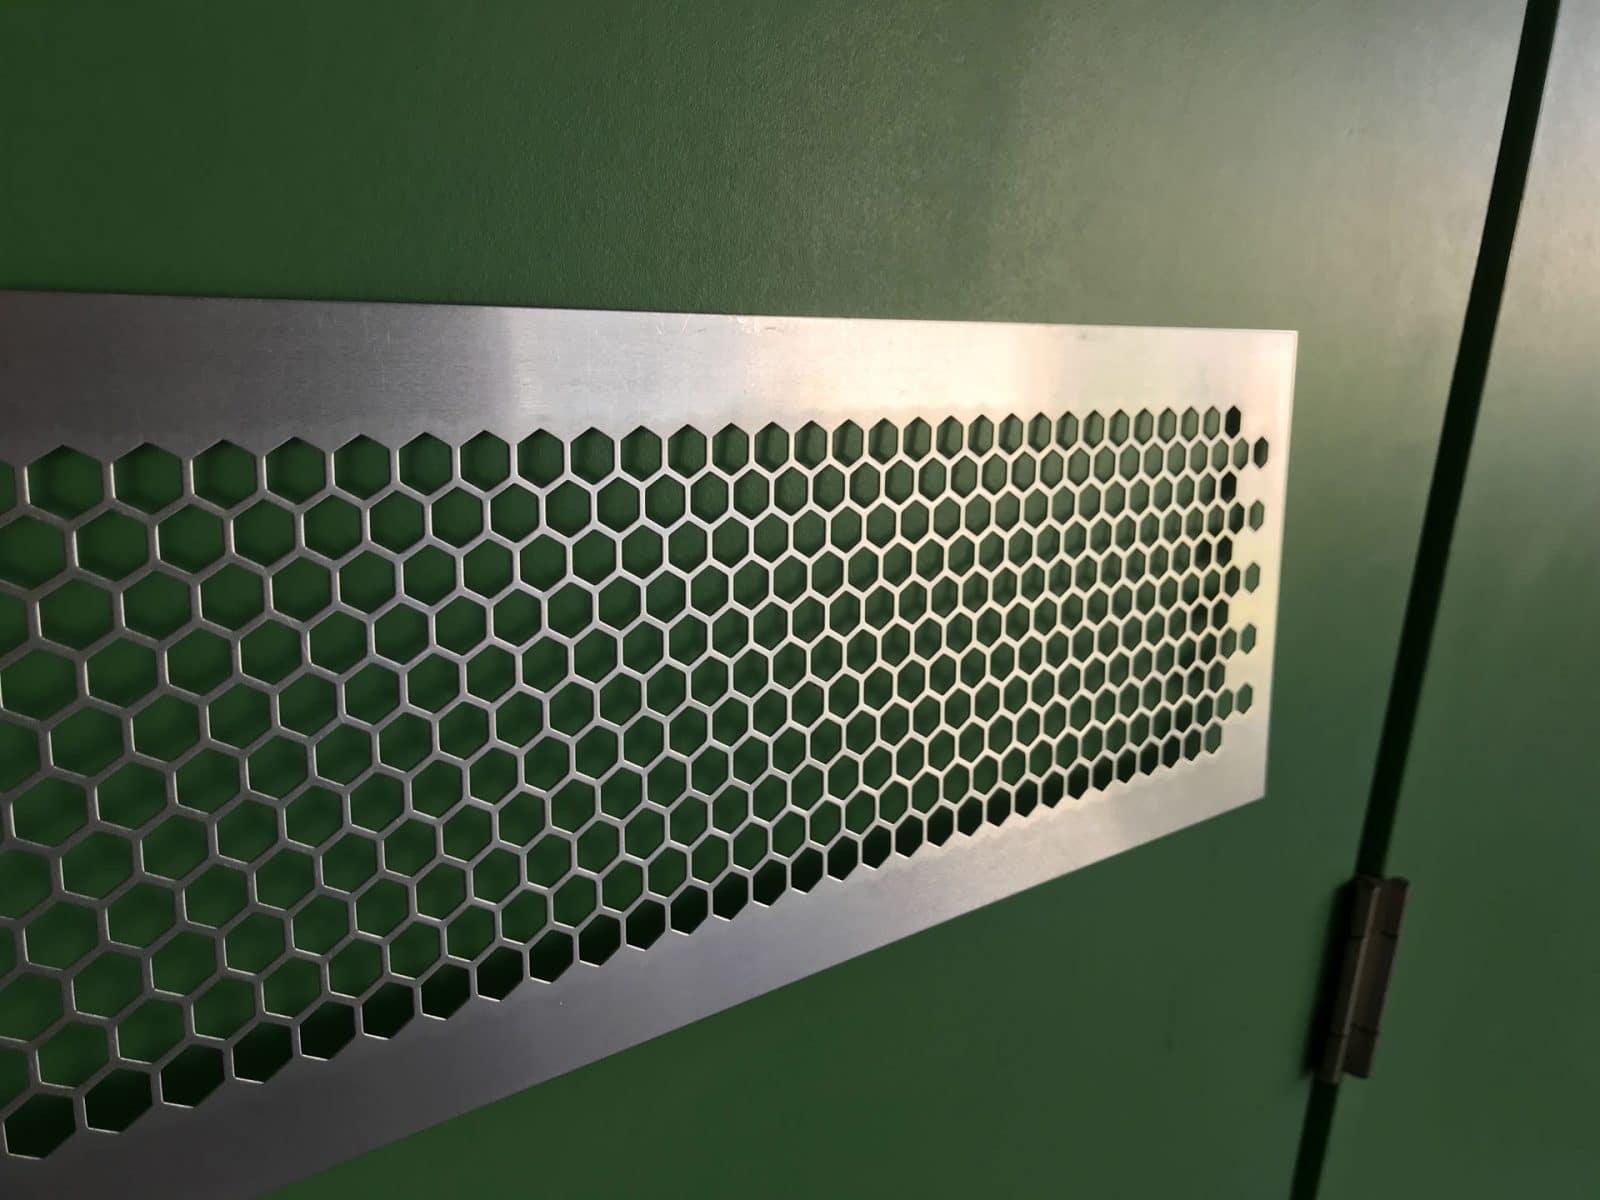 metal perforations in illinois, branko perforating, illinois metal perforations